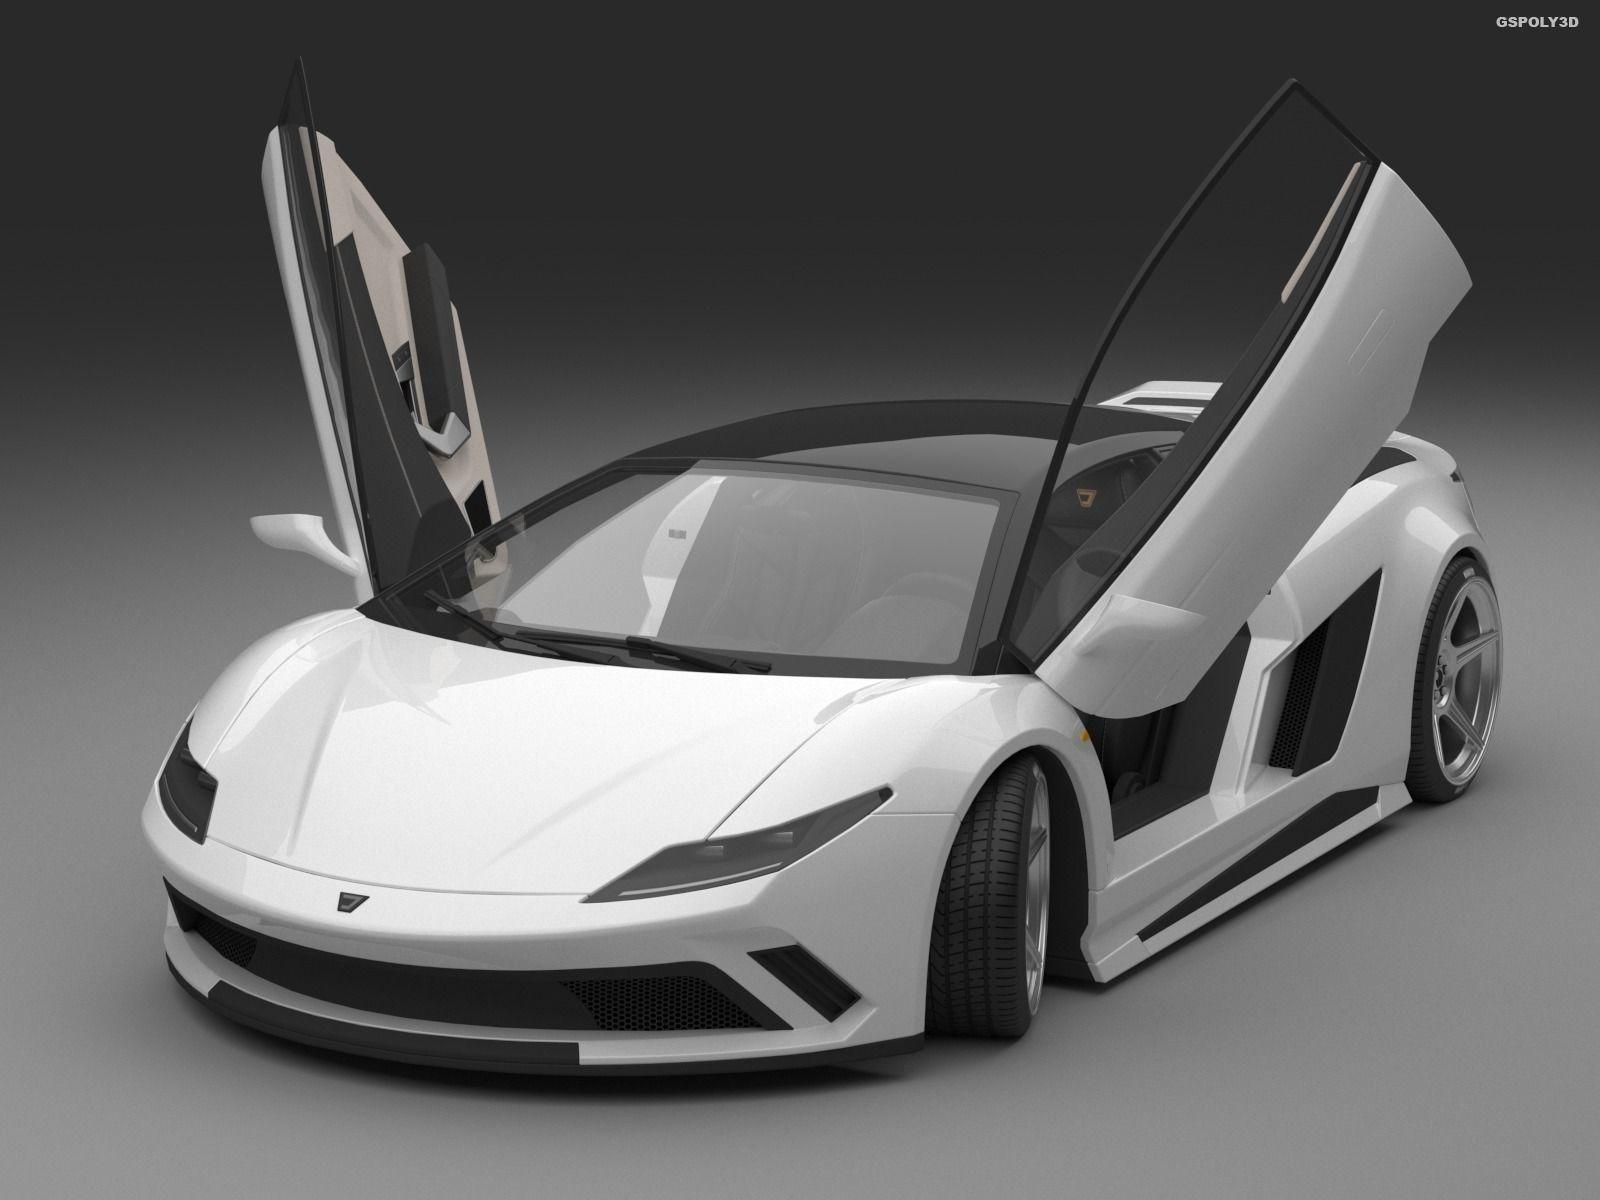 EON Generic sportcar concept